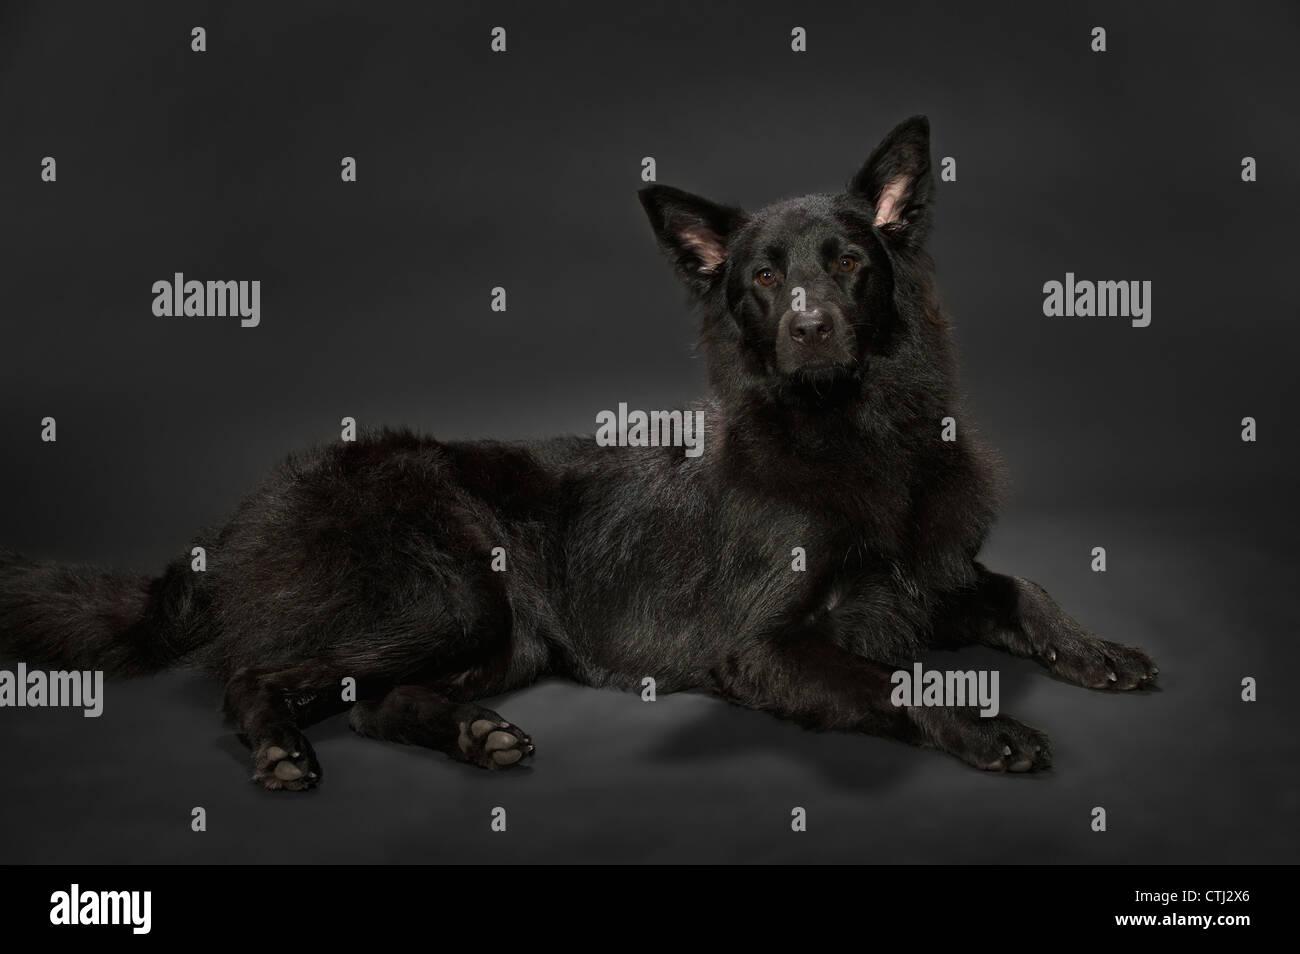 Black Shepherd Dog On A Dark Grey Background - Stock Image